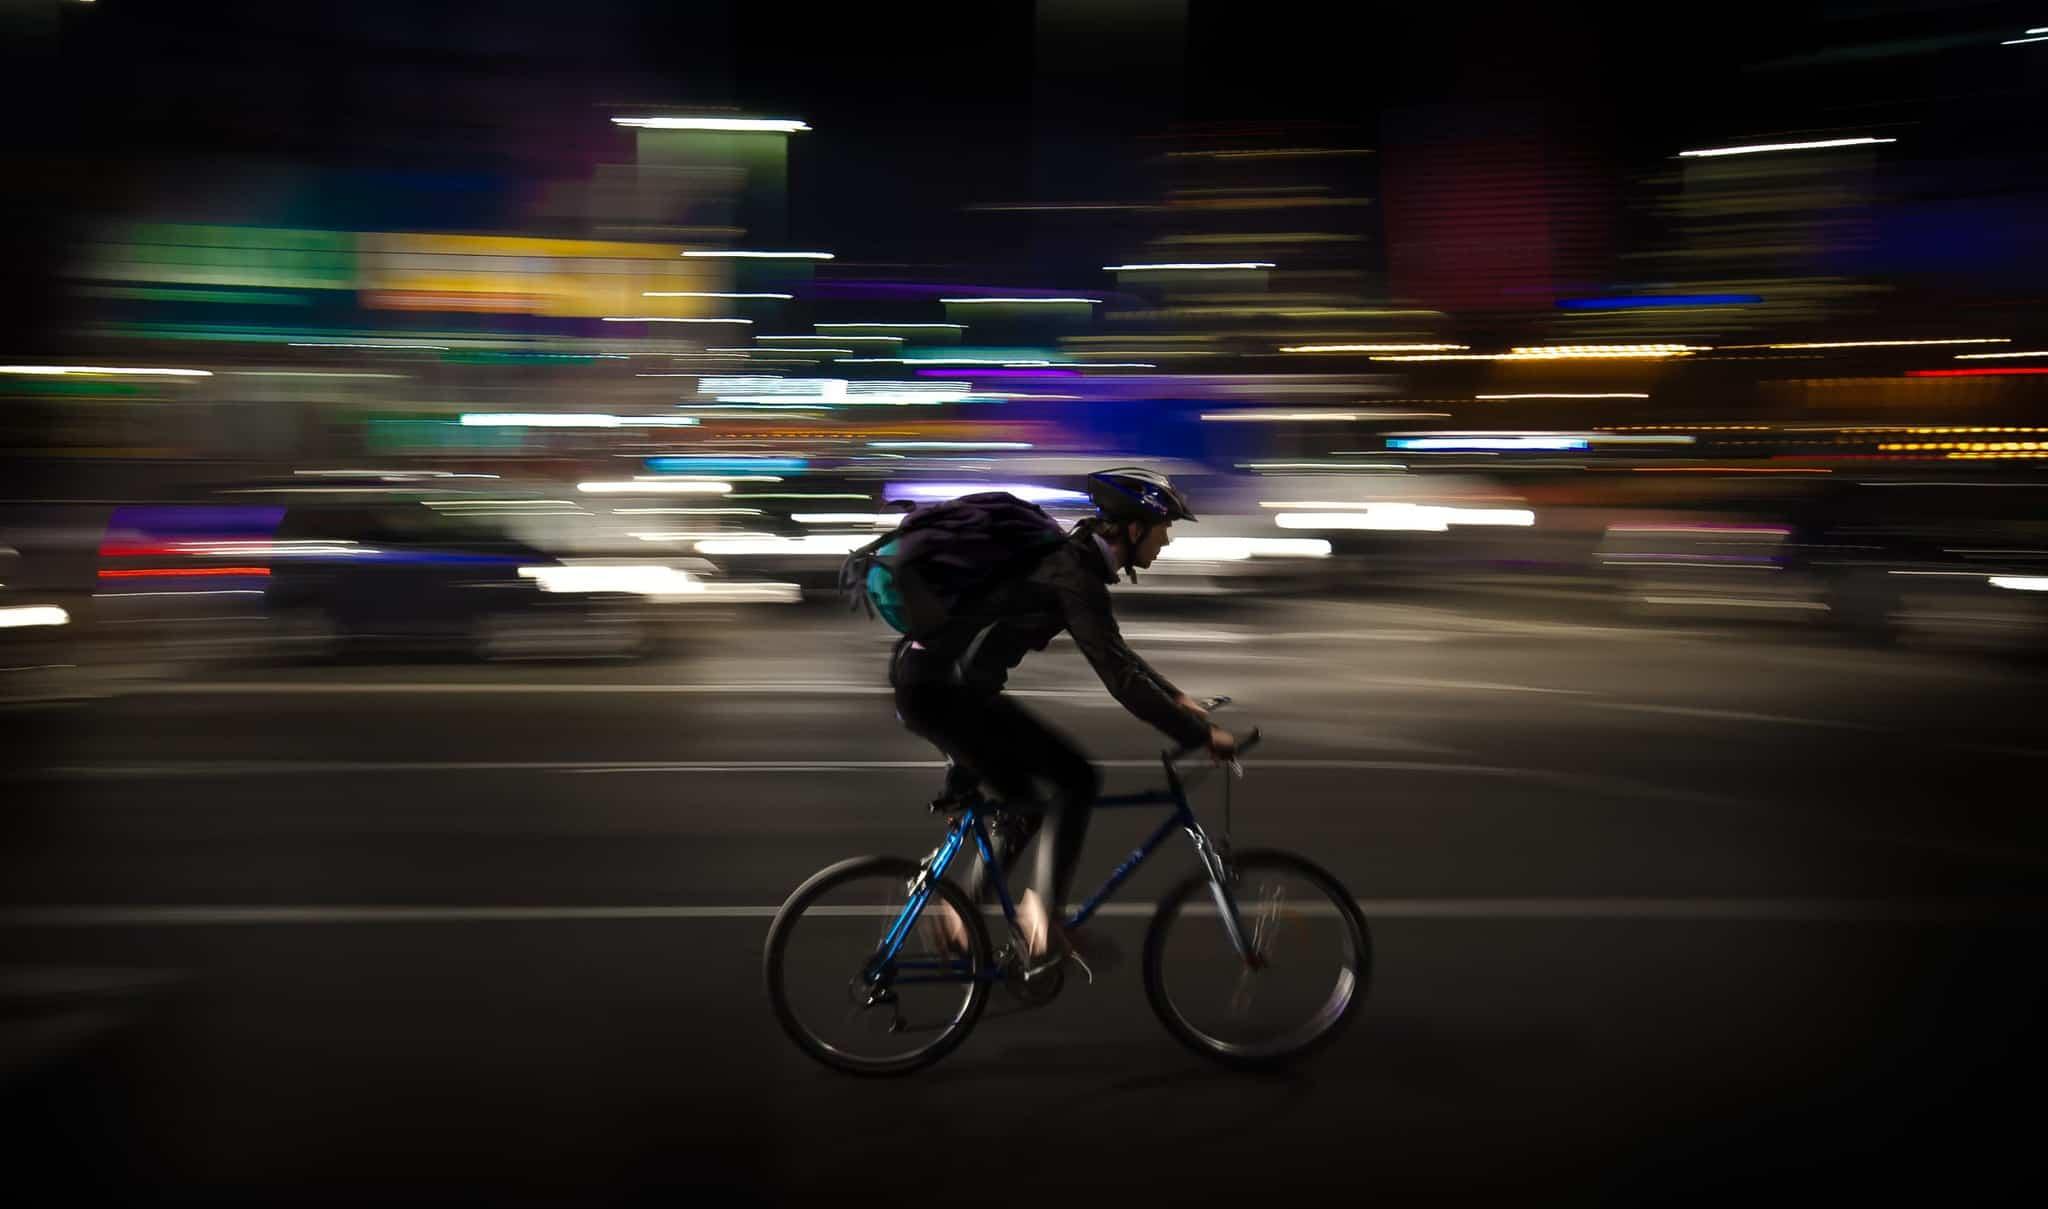 cyclist riding a bike with a blurred dark background